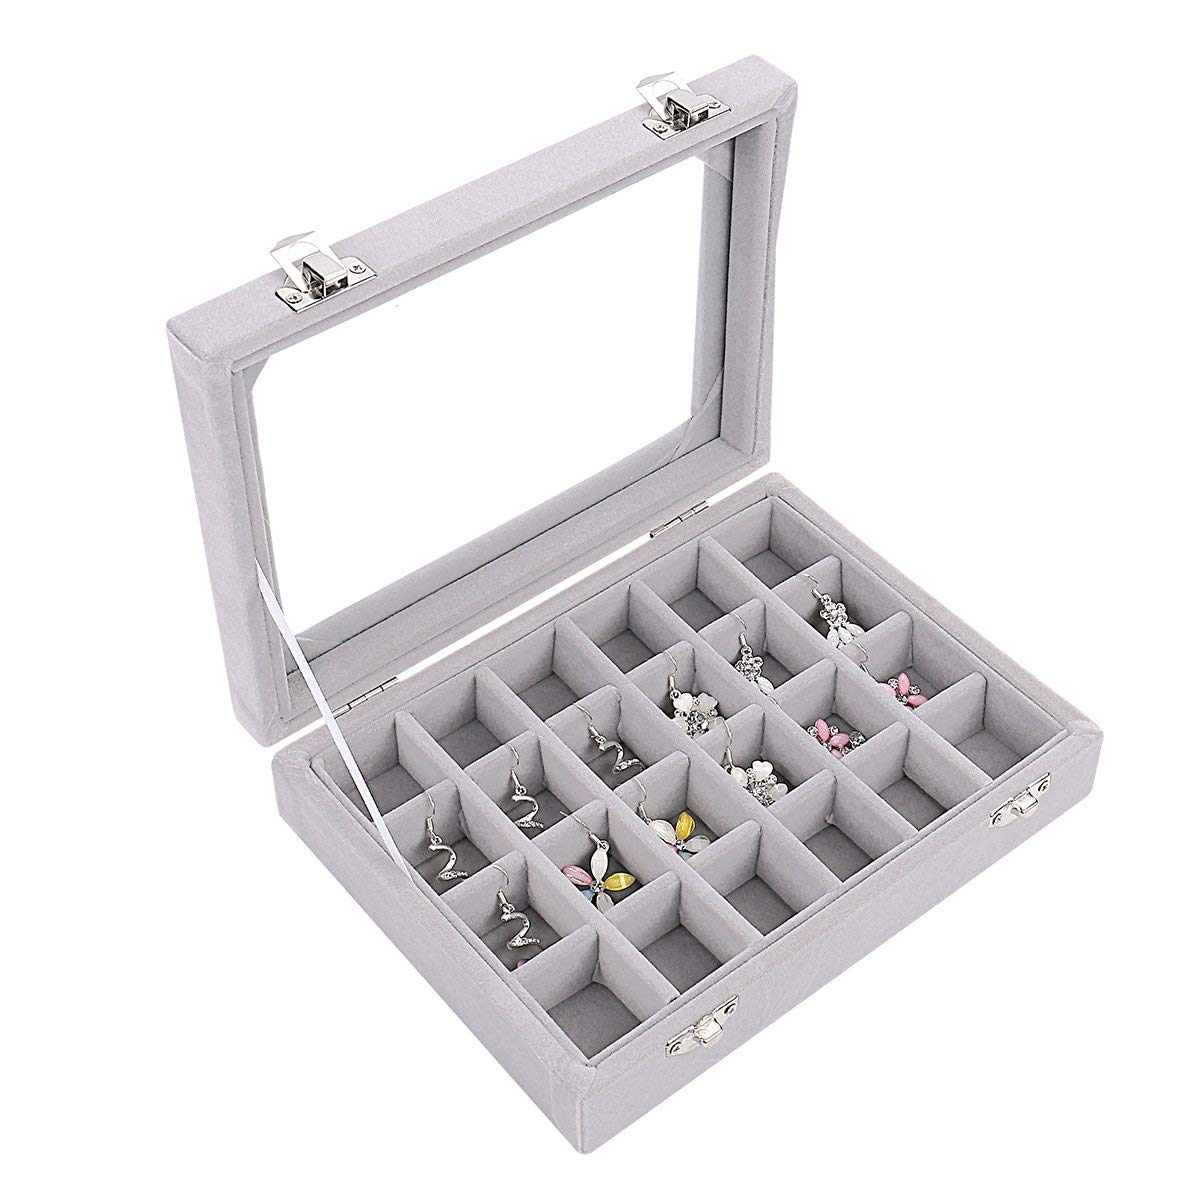 Velvet Glass Ring Earring Jewelry Organizer Box Tray Holder Storage Case Display